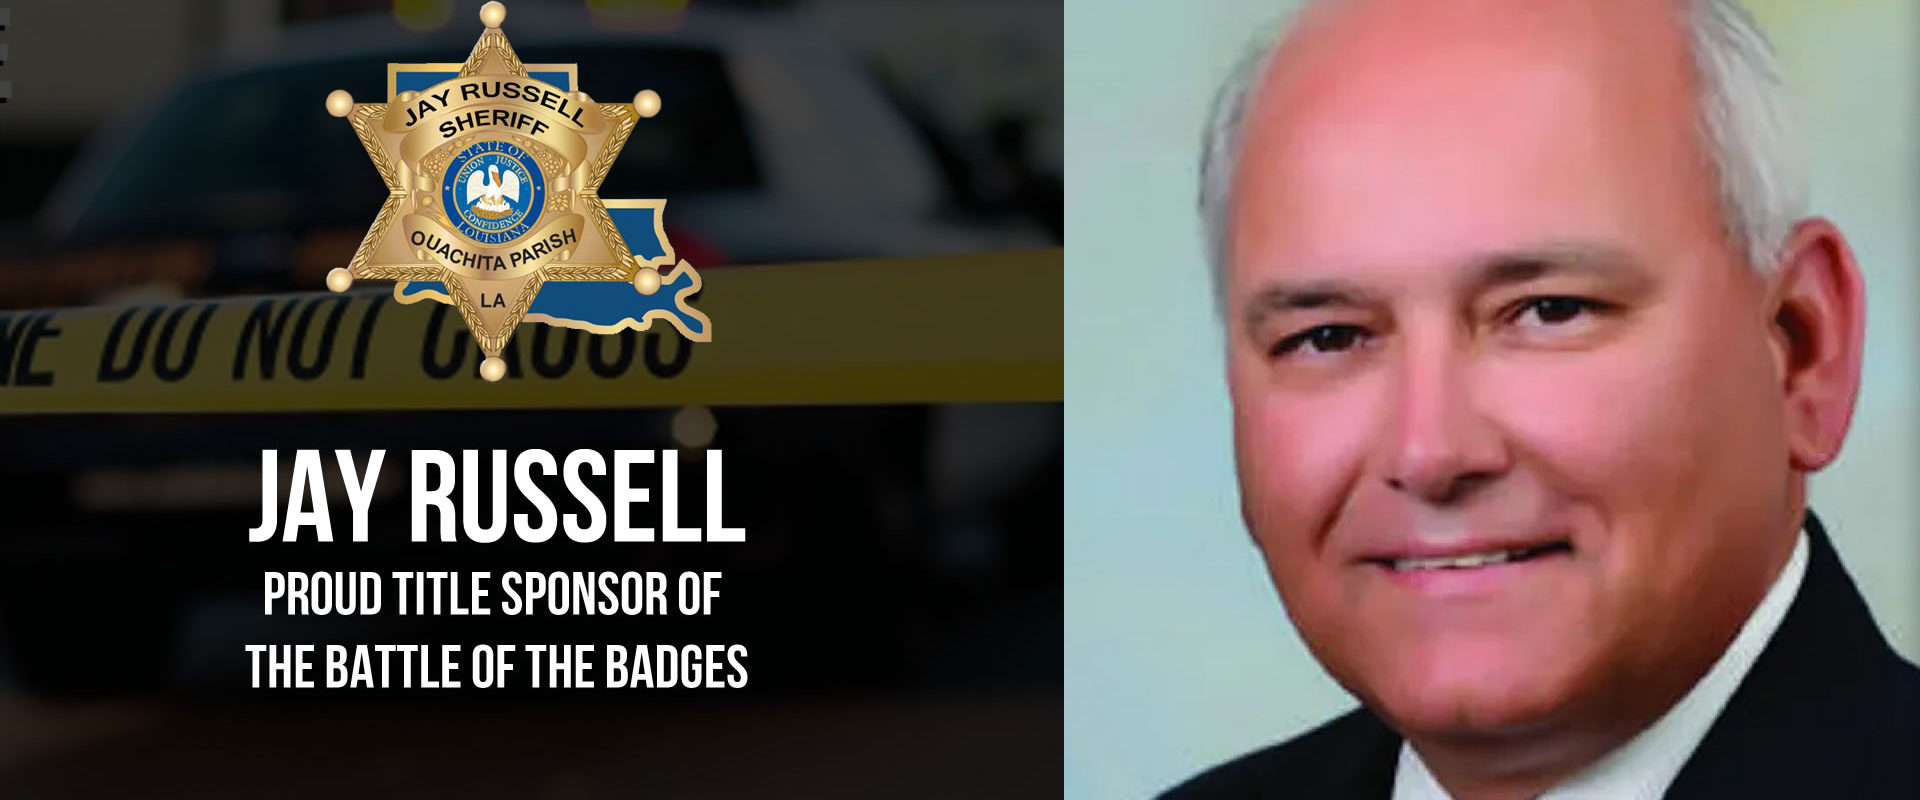 Sherriff J. Russell - Title Sponsor